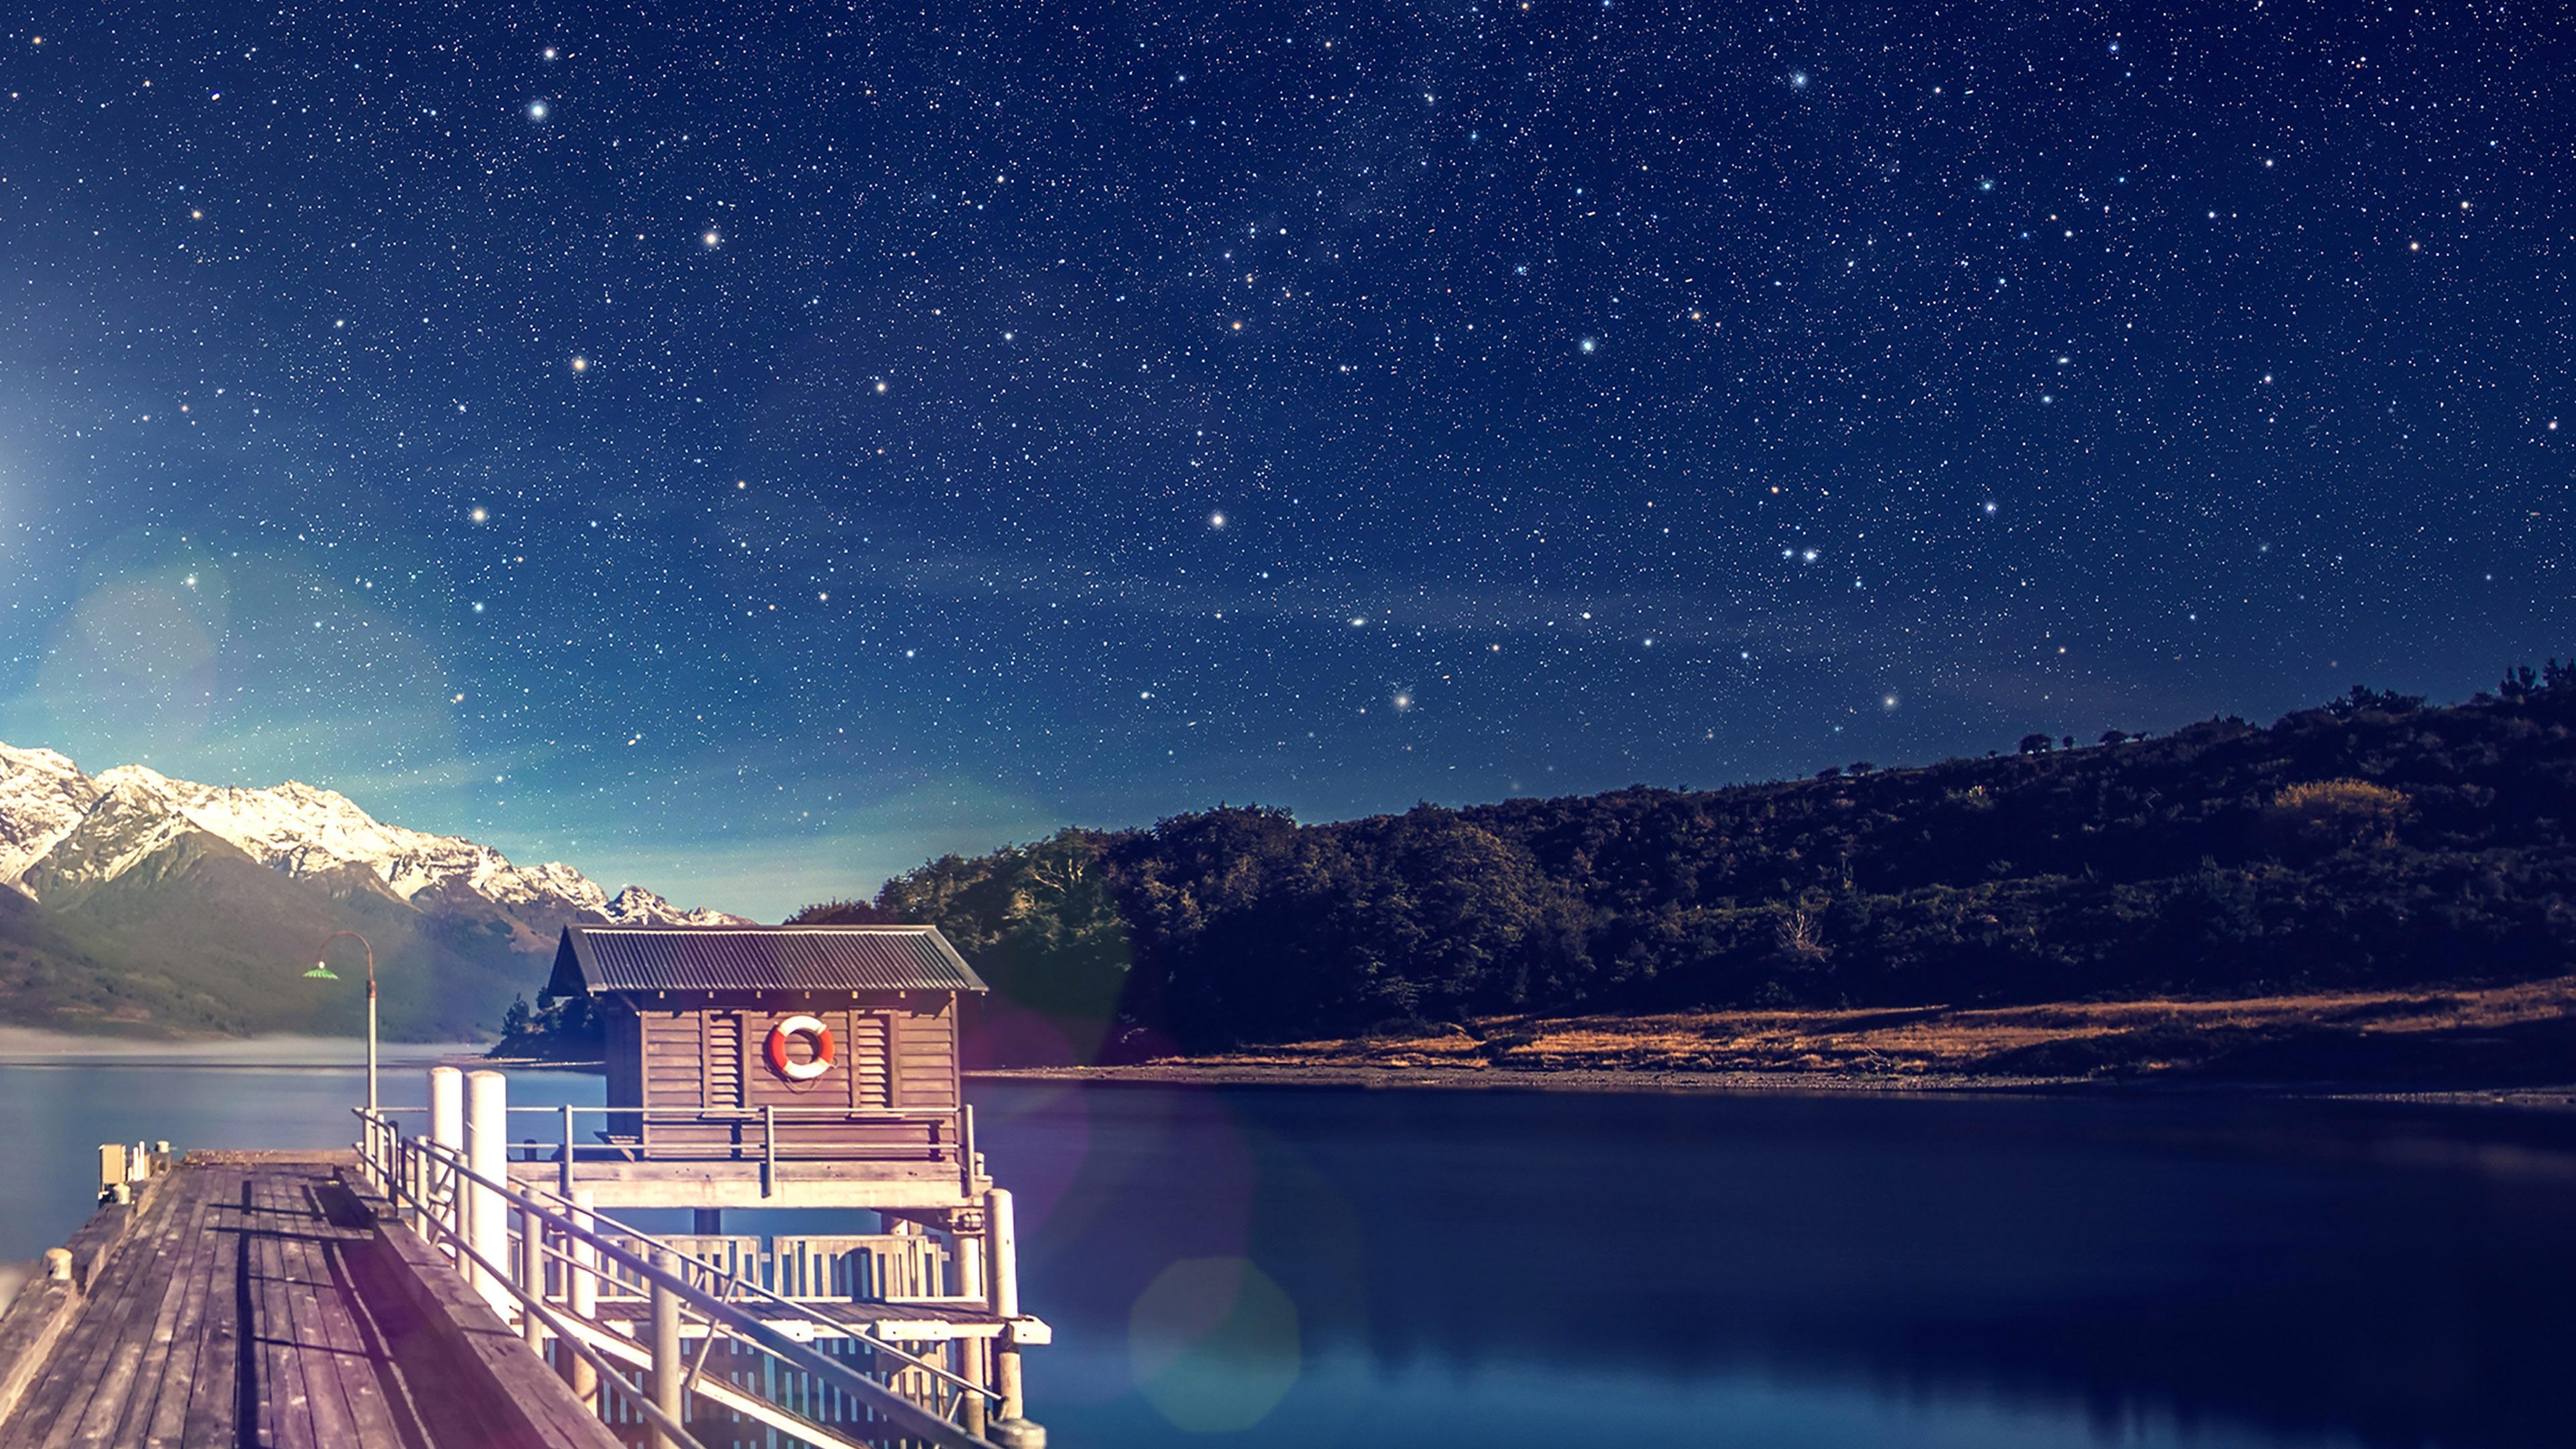 mm11-star-shiny-lake-blue-sky-space-boat-flare-wallpaper